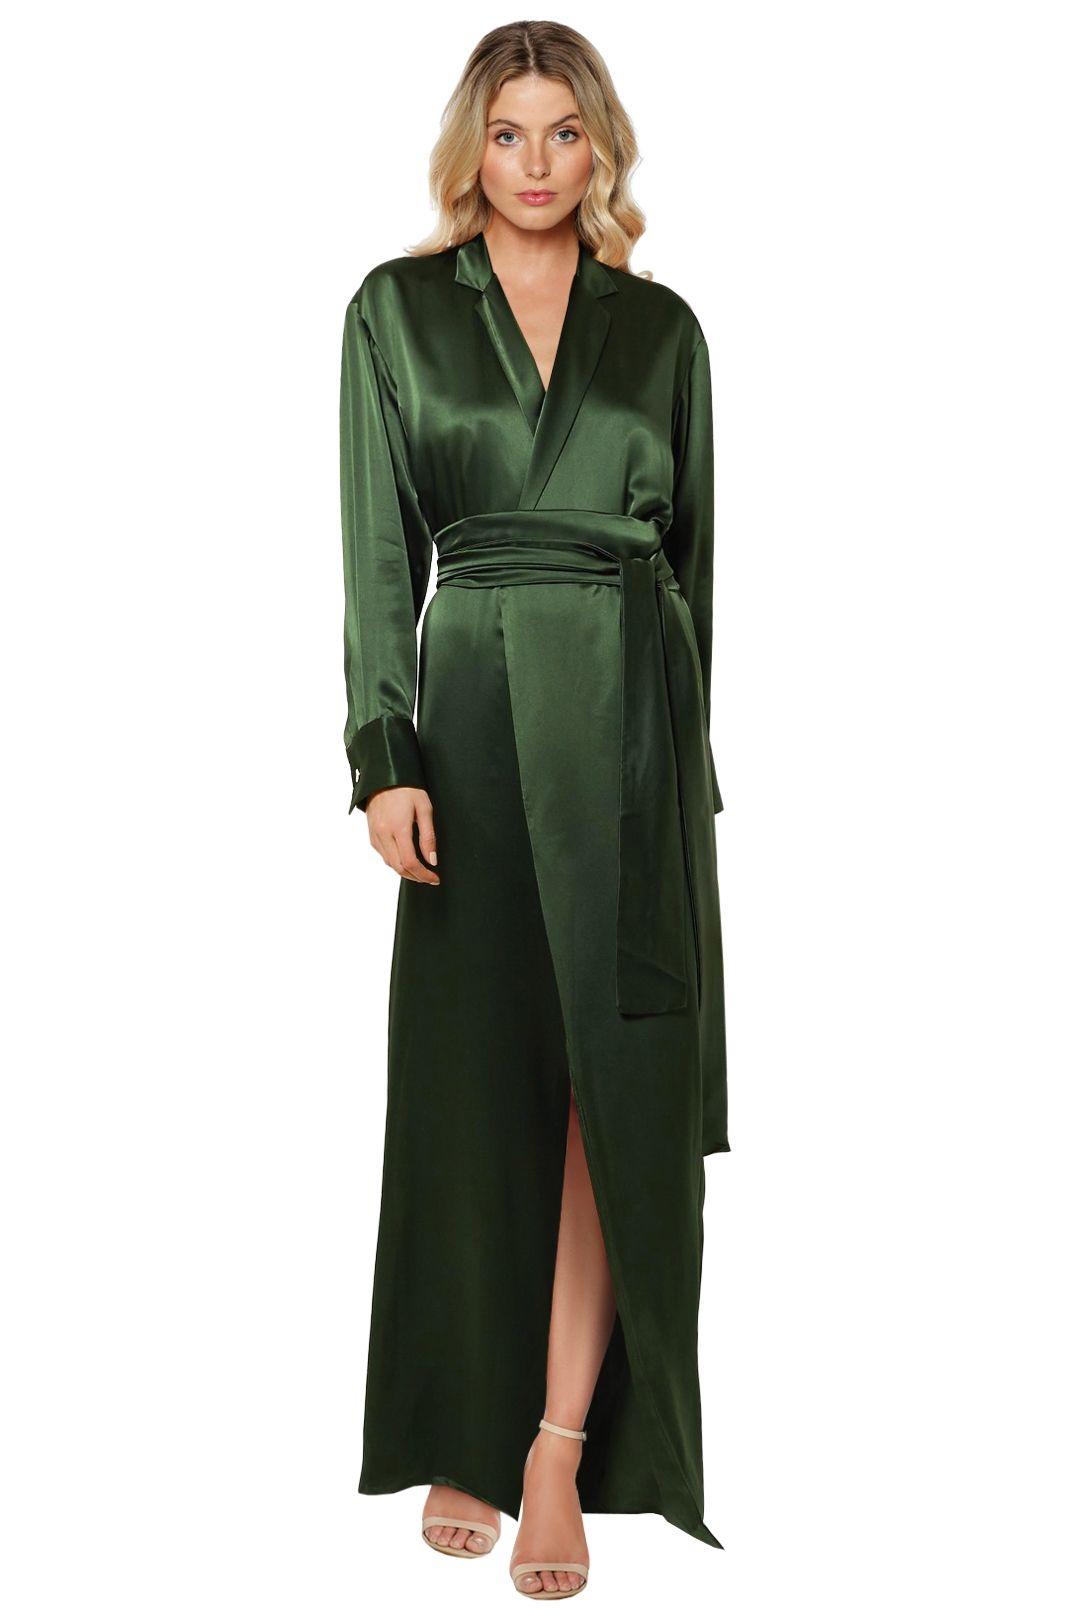 Michael Lo Sordo - Silk Satin Maxi Dress - Green - Front